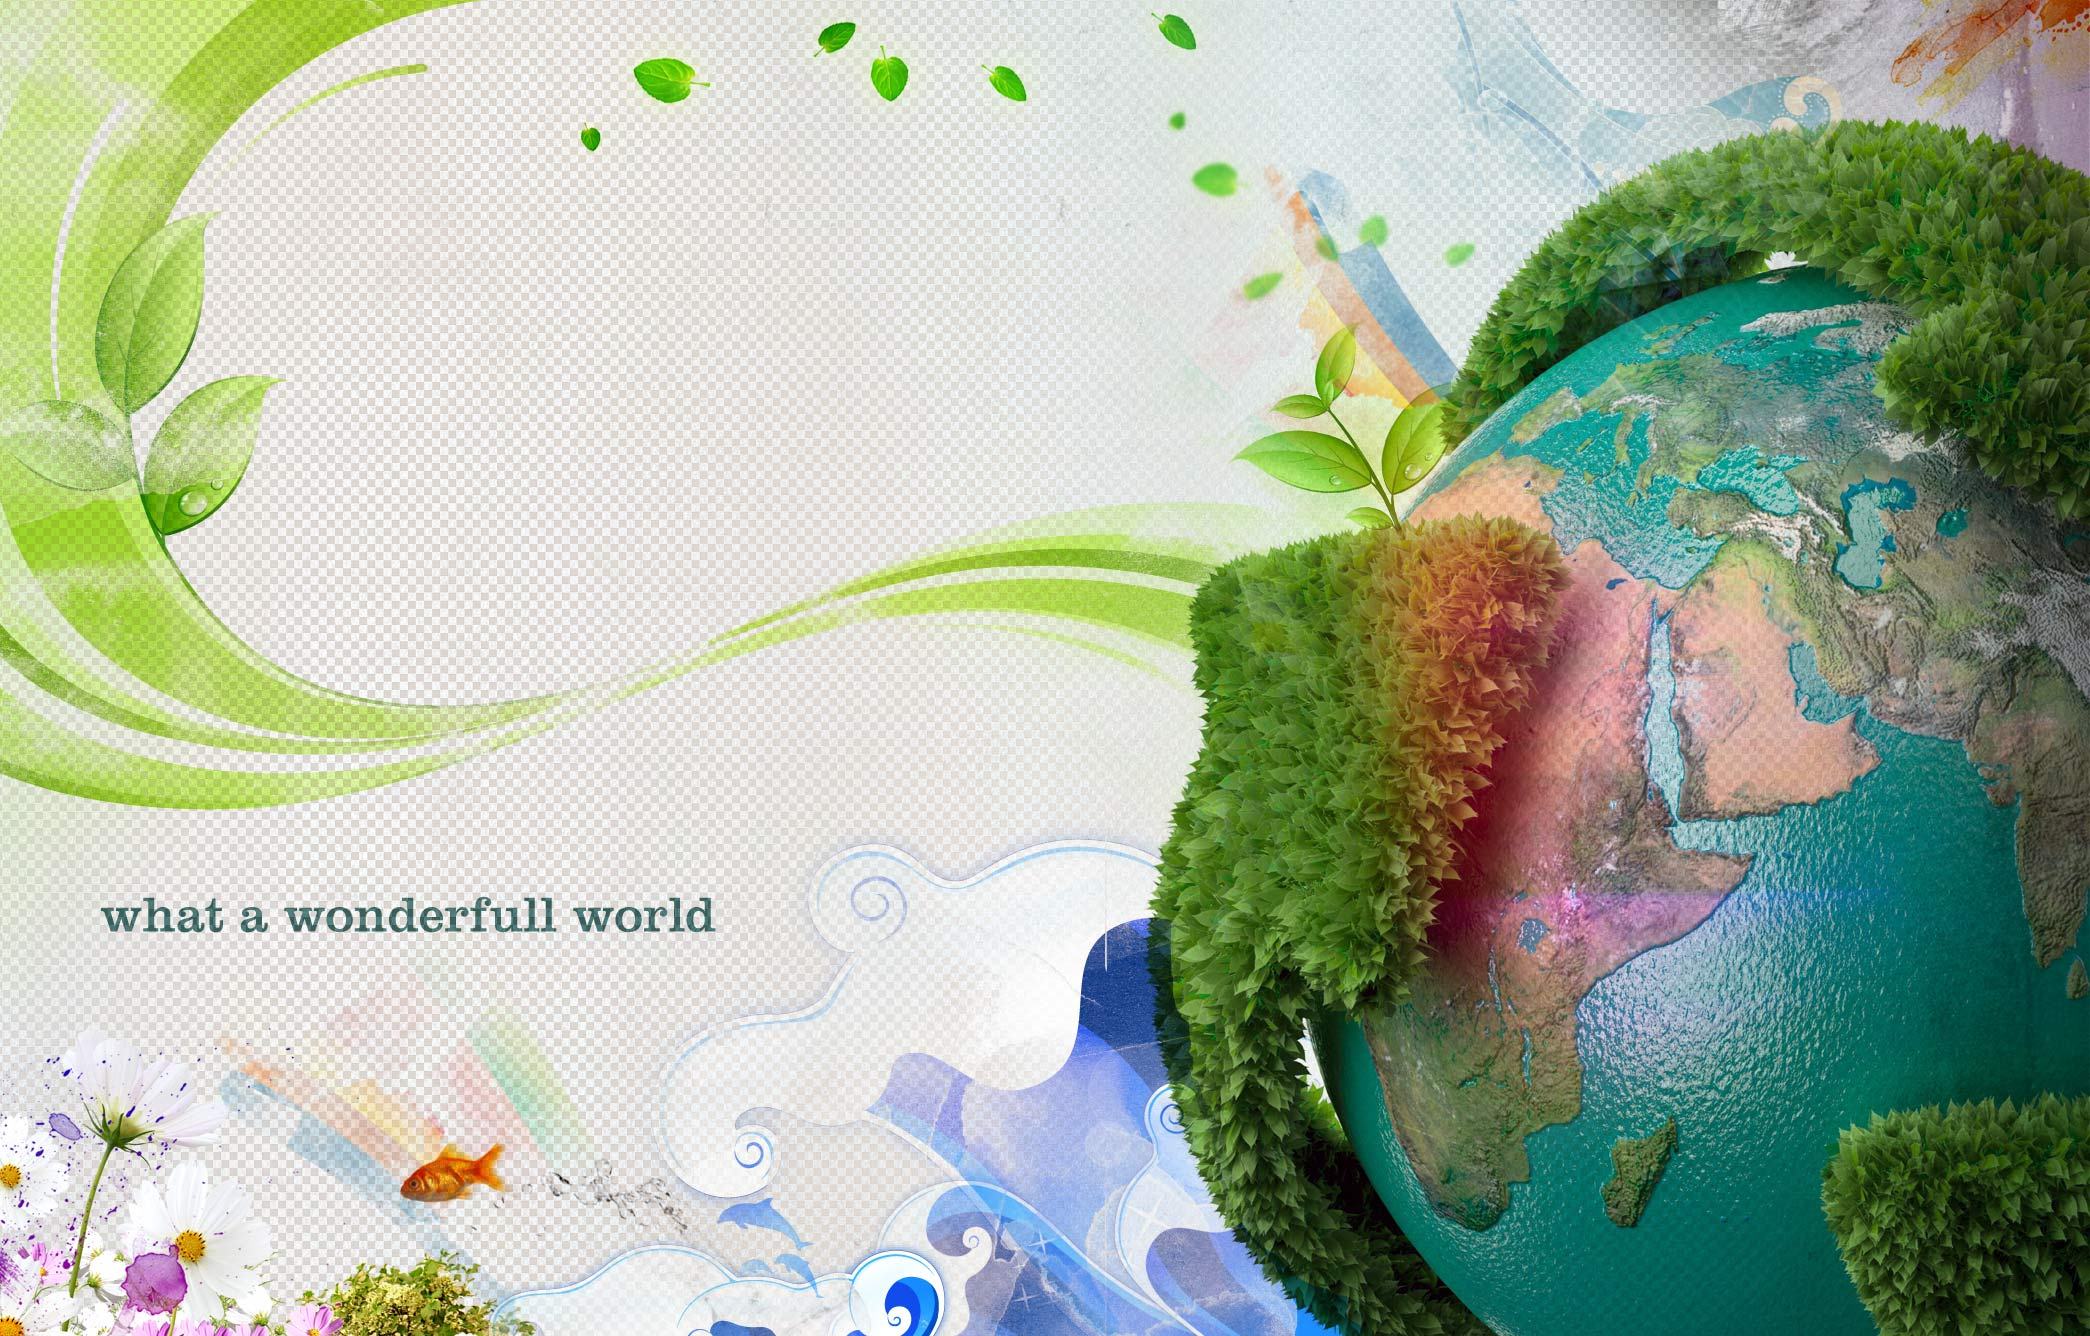 What a Wonderfull World Happy Earth Day